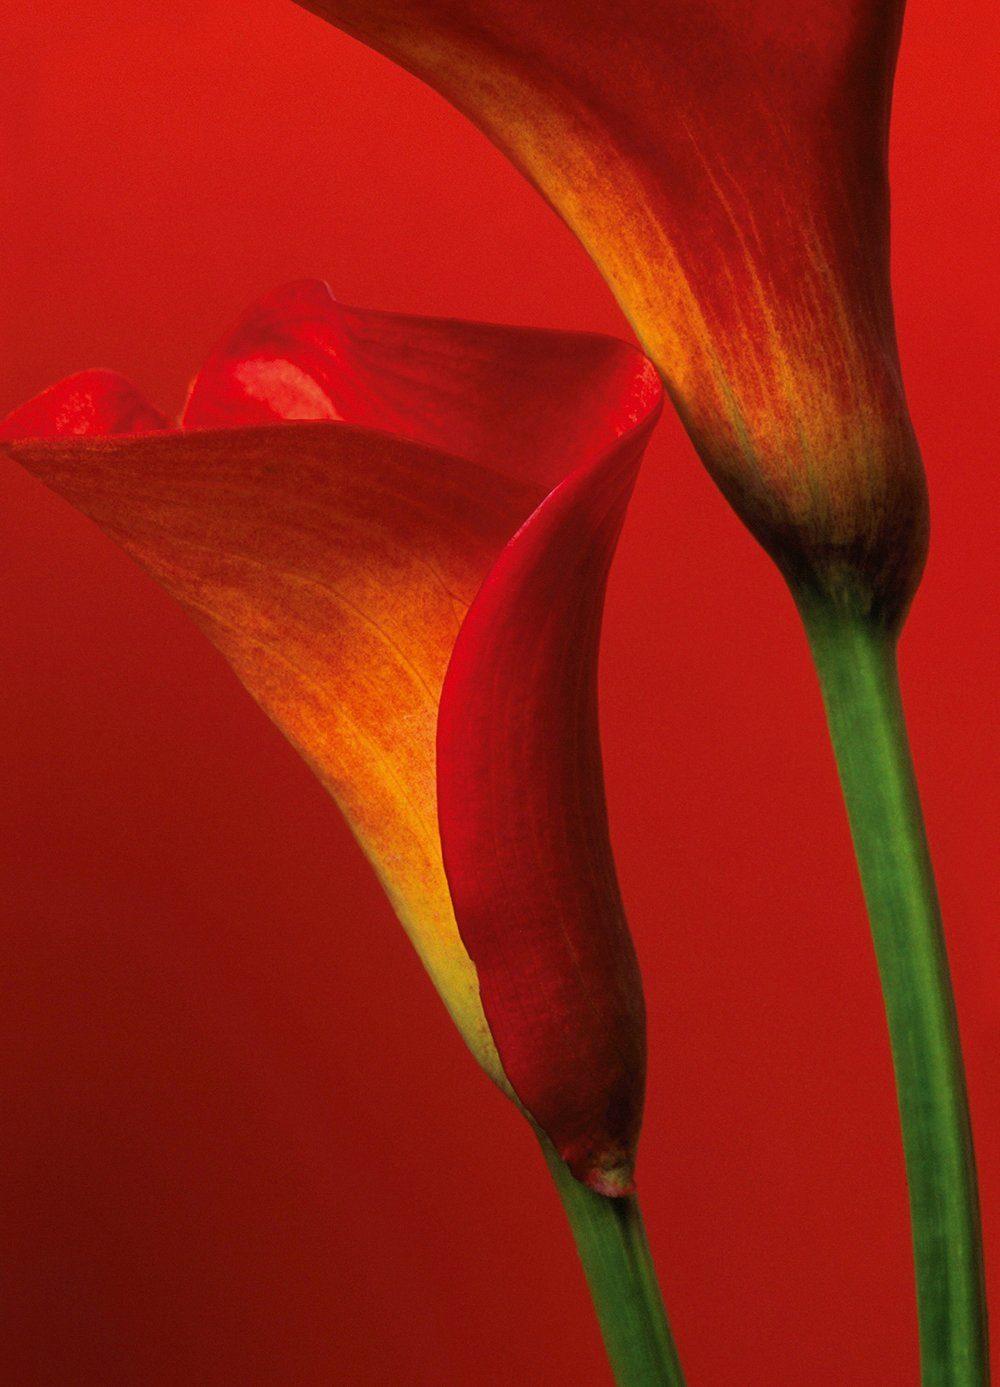 Fototapete »Red Calla Lilies«, 4-teilig, 183x254 cm